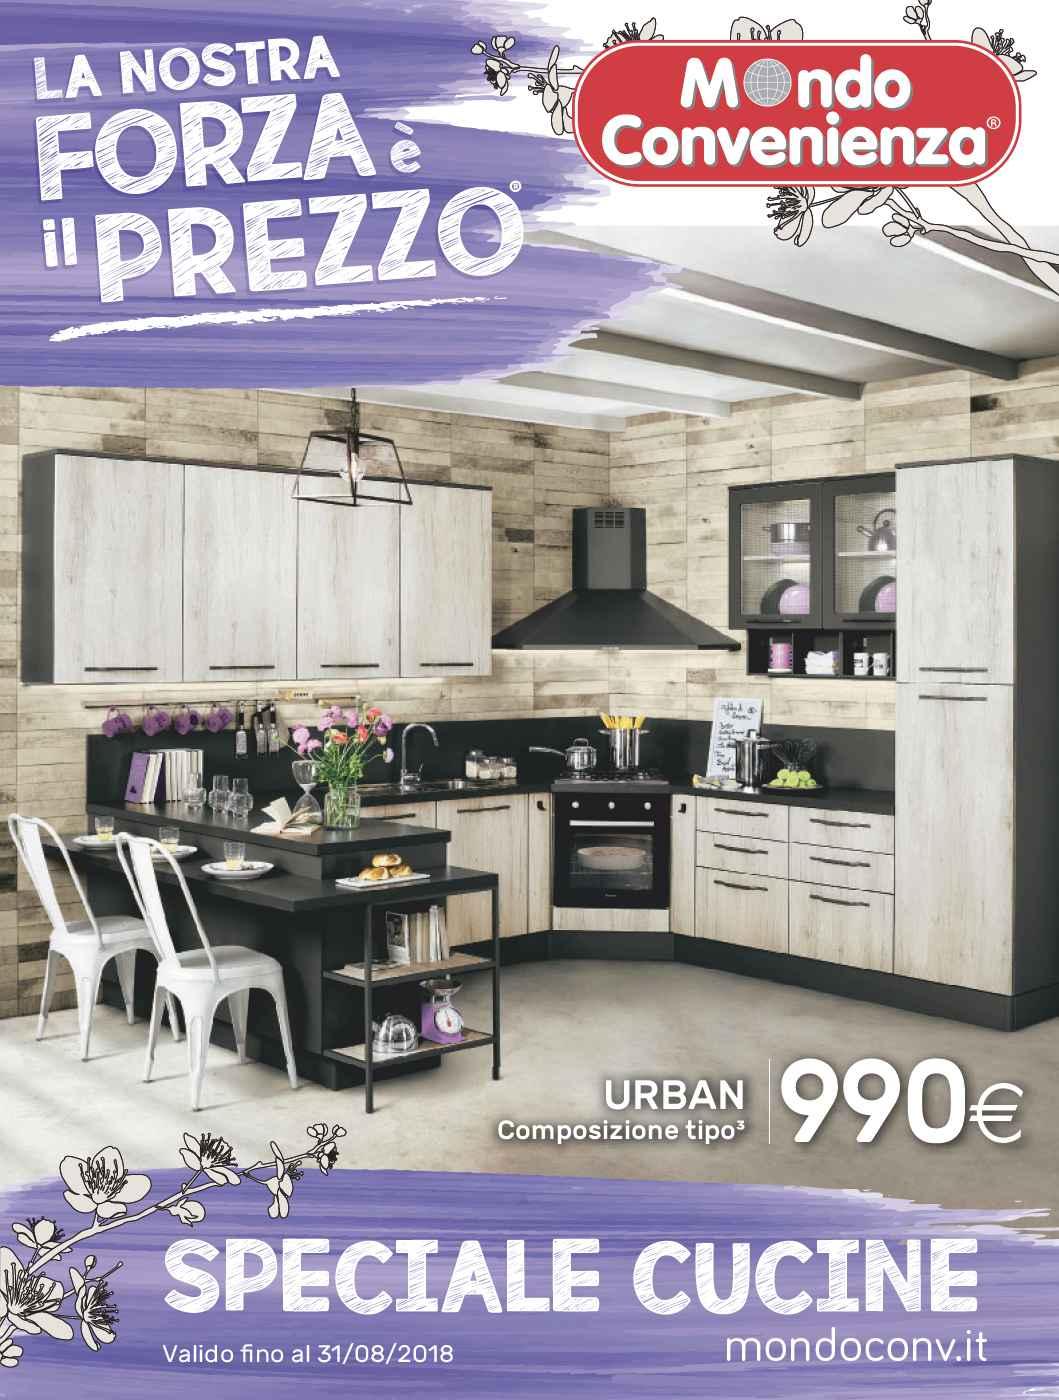 Cucine Moderne Mondo Convenienza 2018.Catalogo Primavera 2018 Cucine